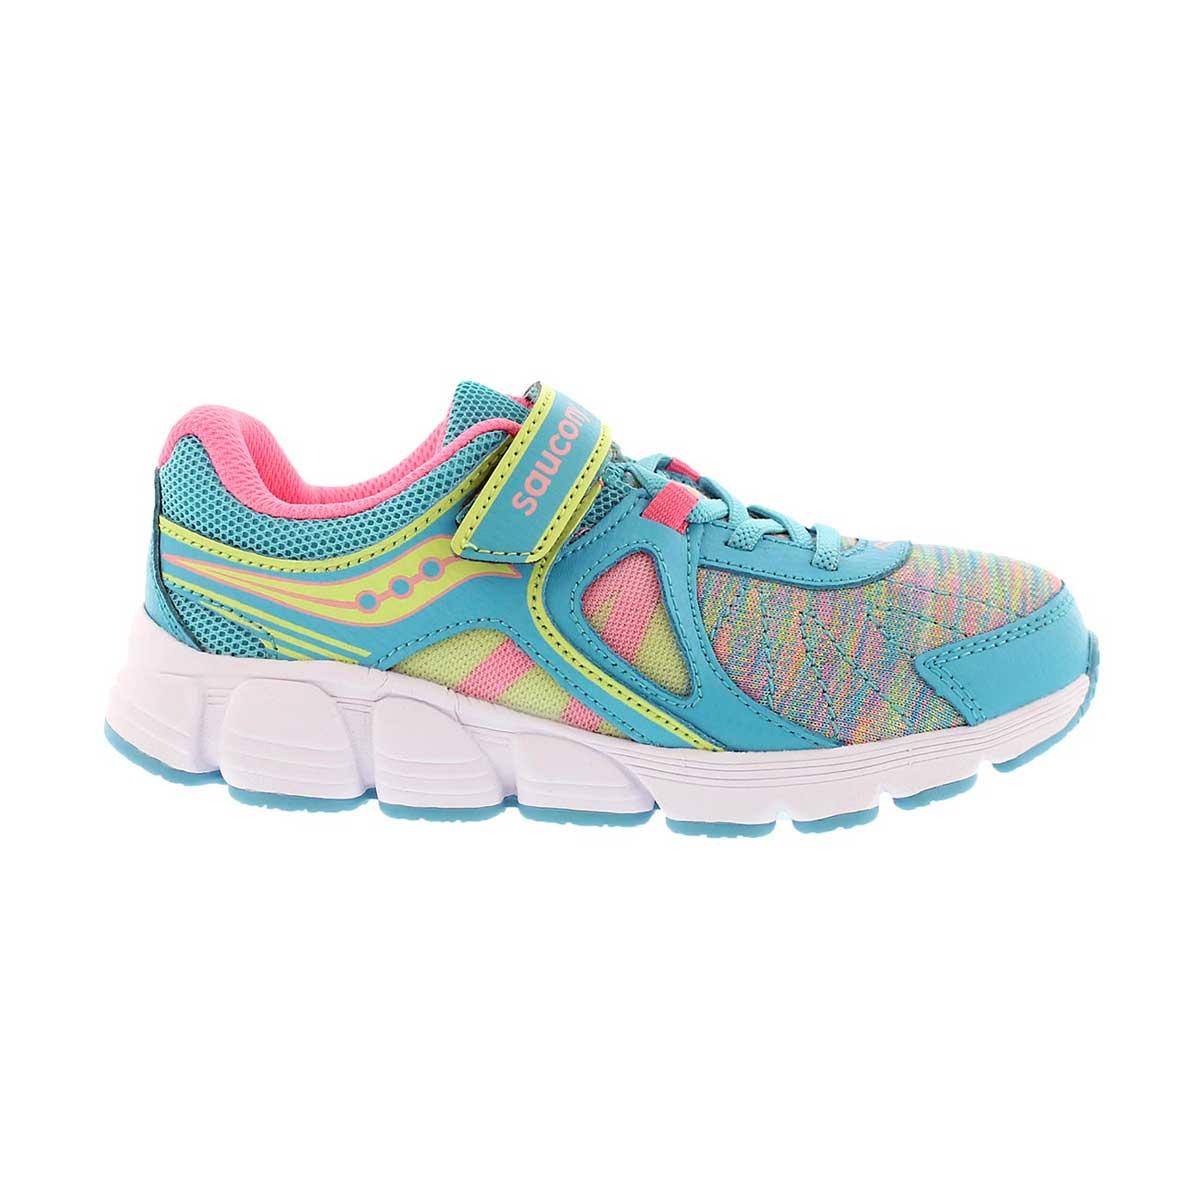 Grls Kotaro 3 AC turq/mlti running shoe